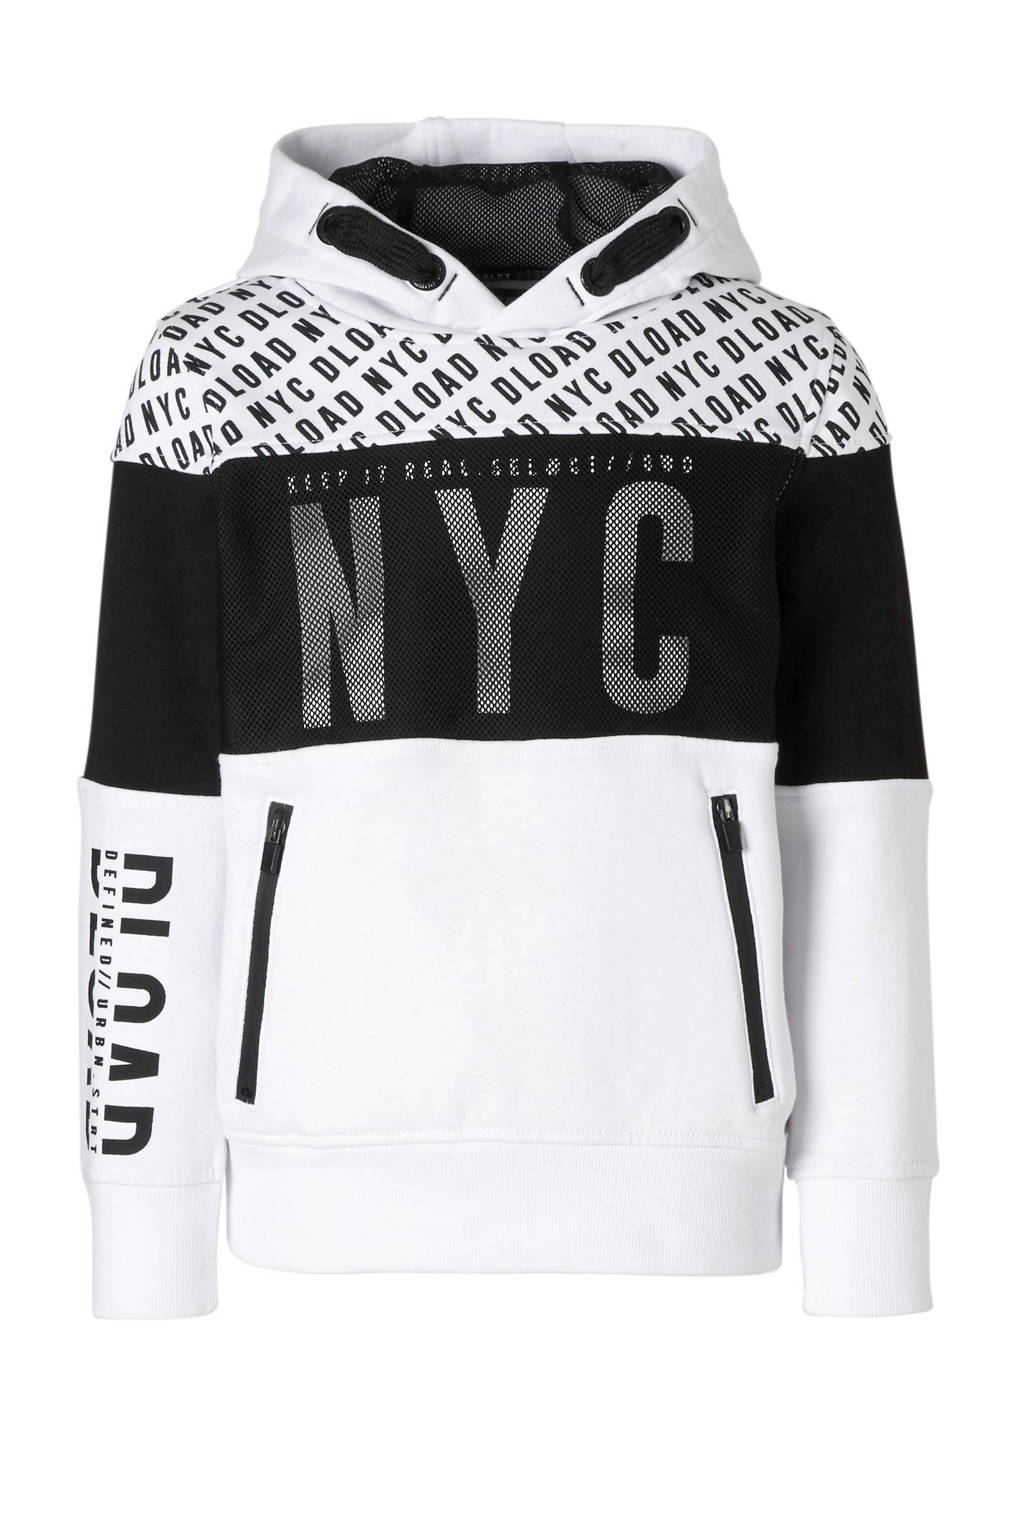 C&A Here & There hoodie met mesh wit, Wit/zwart